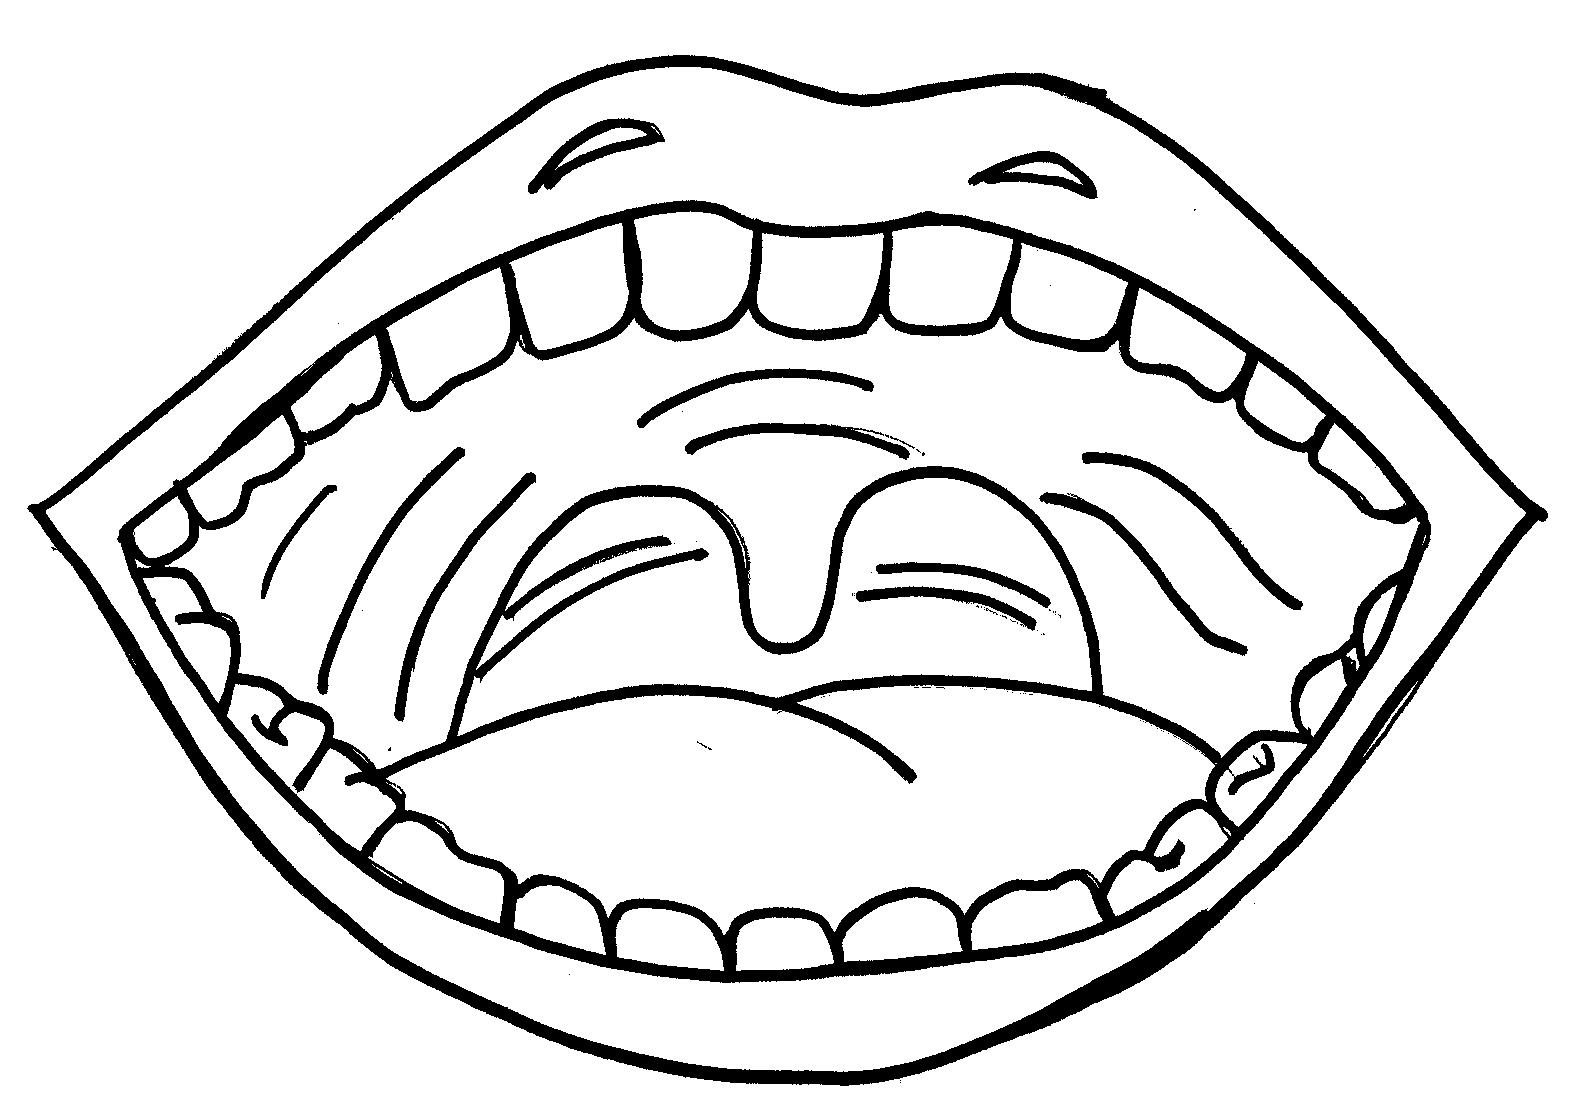 Desenhos Para Colorir De Hipop Tamo – Pampekids Net